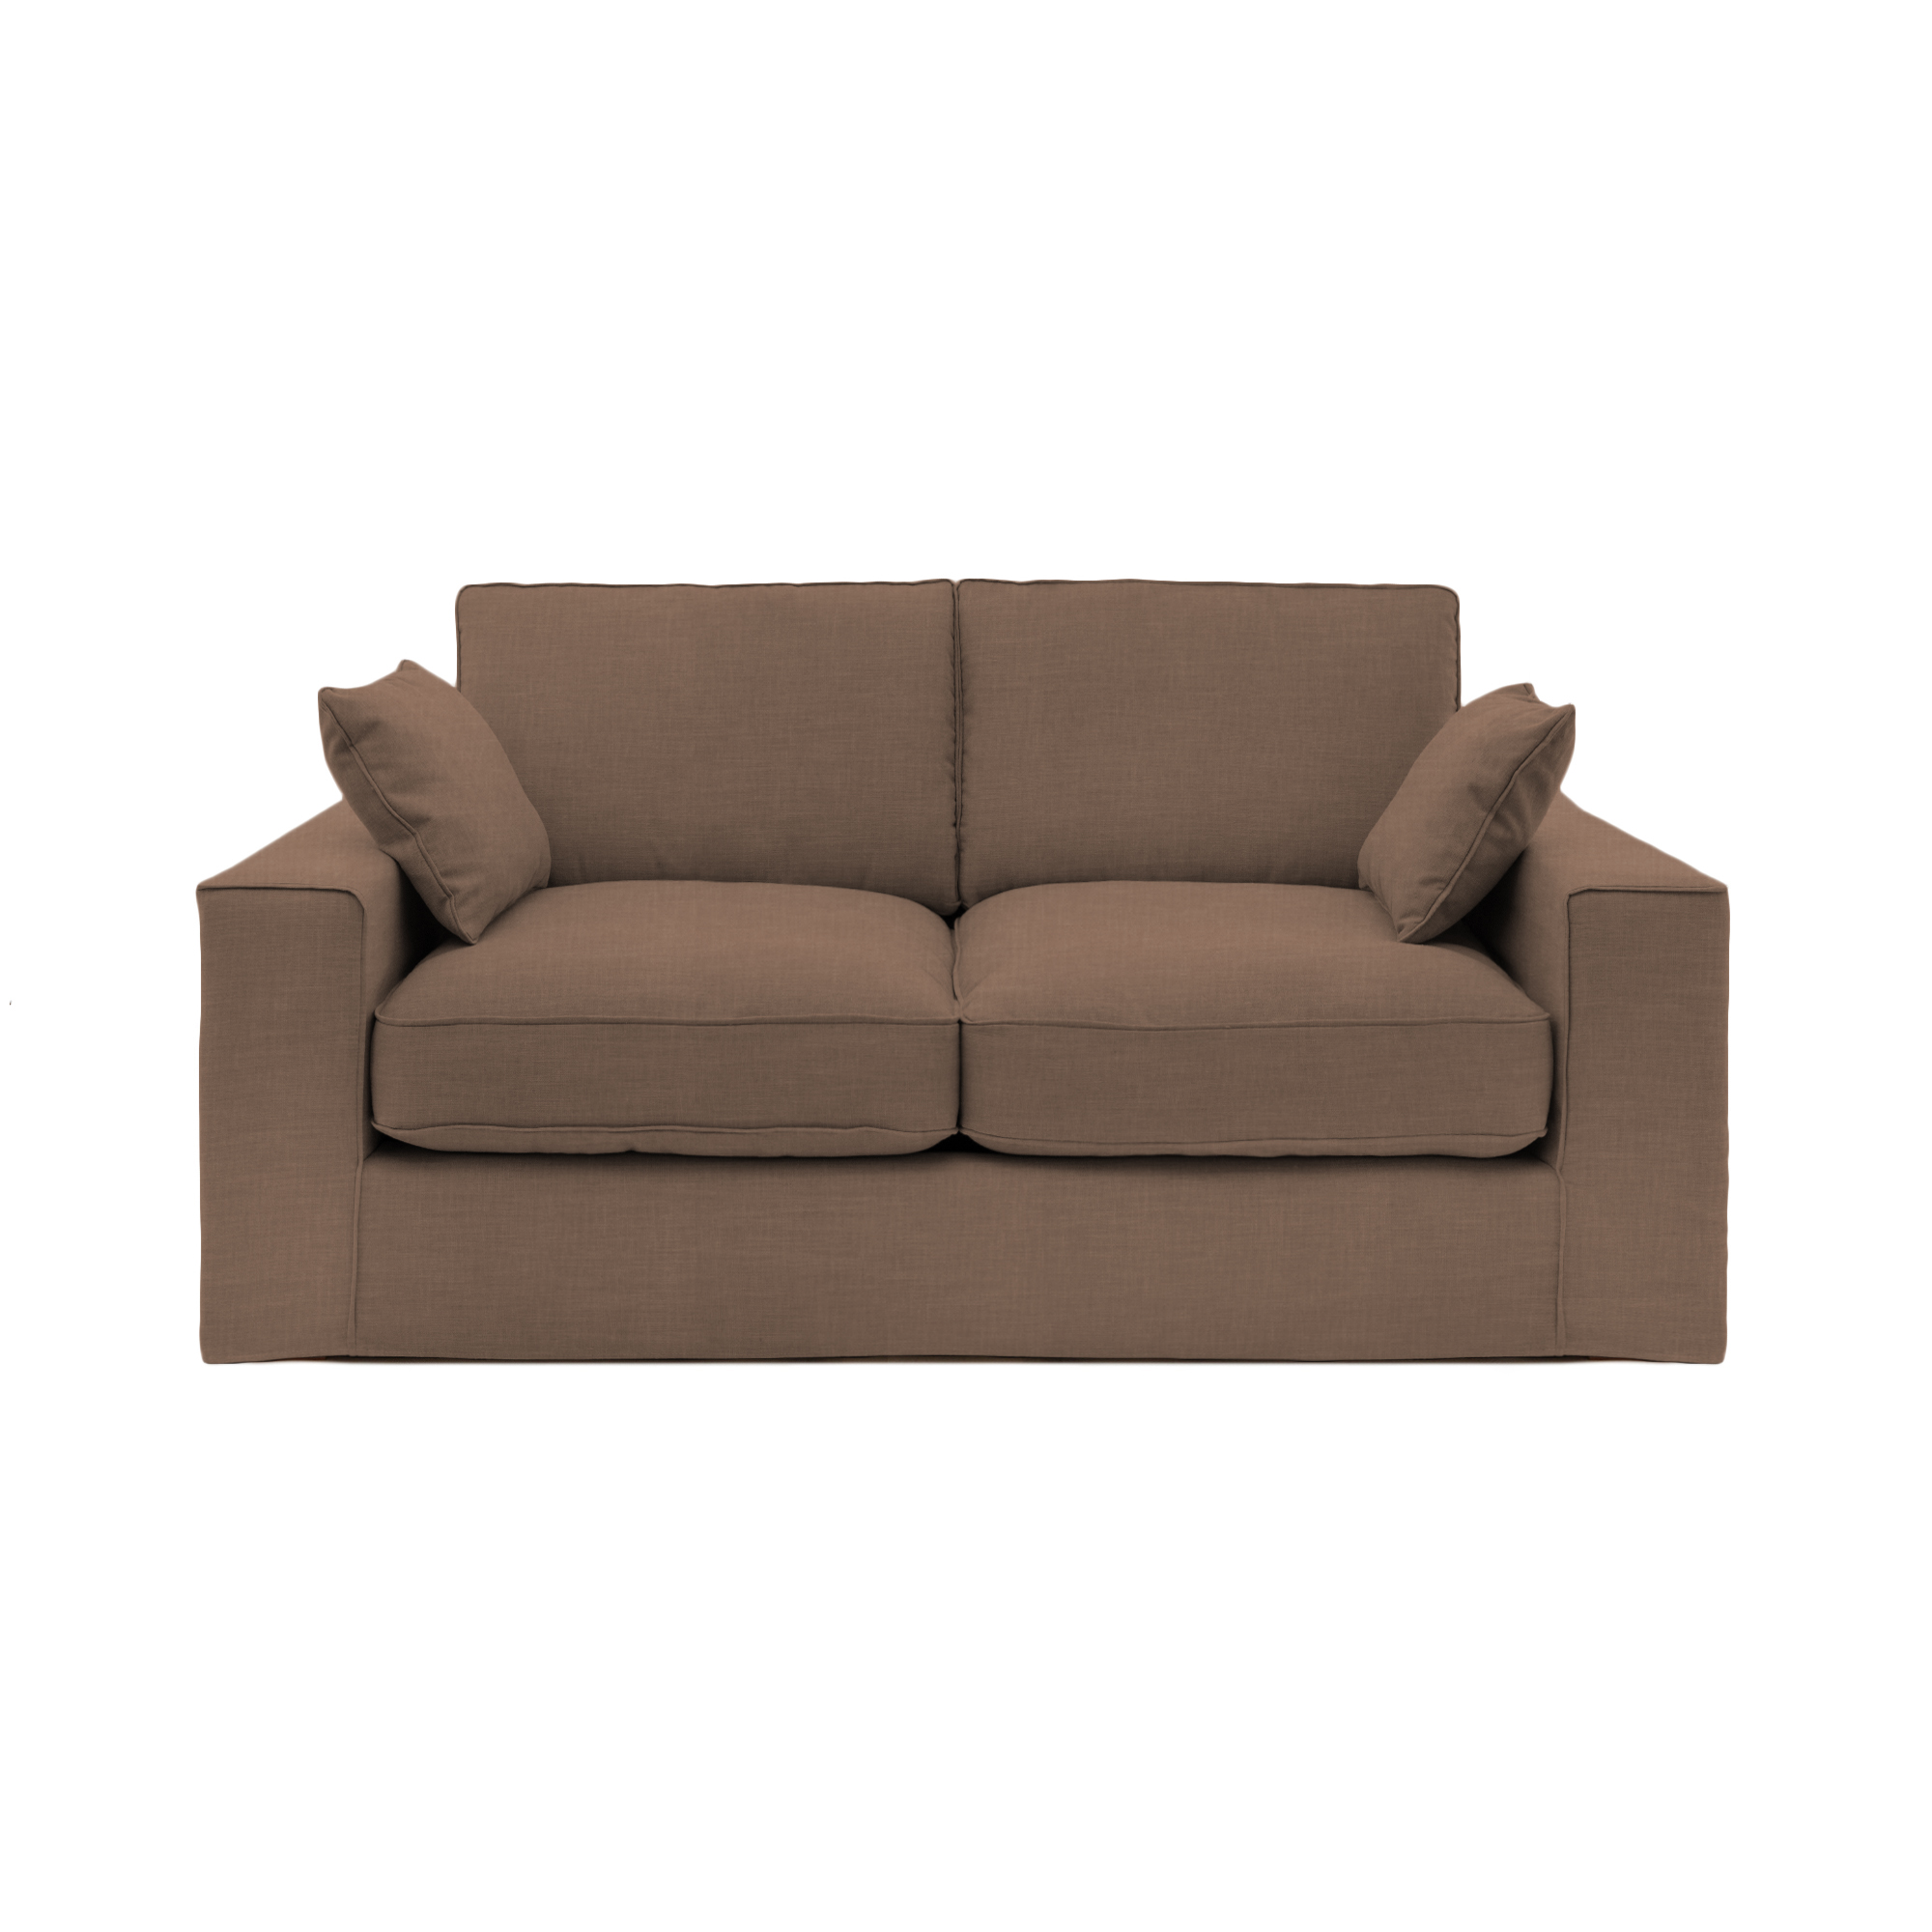 Canapea Fixa 3 locuri Jane Brown